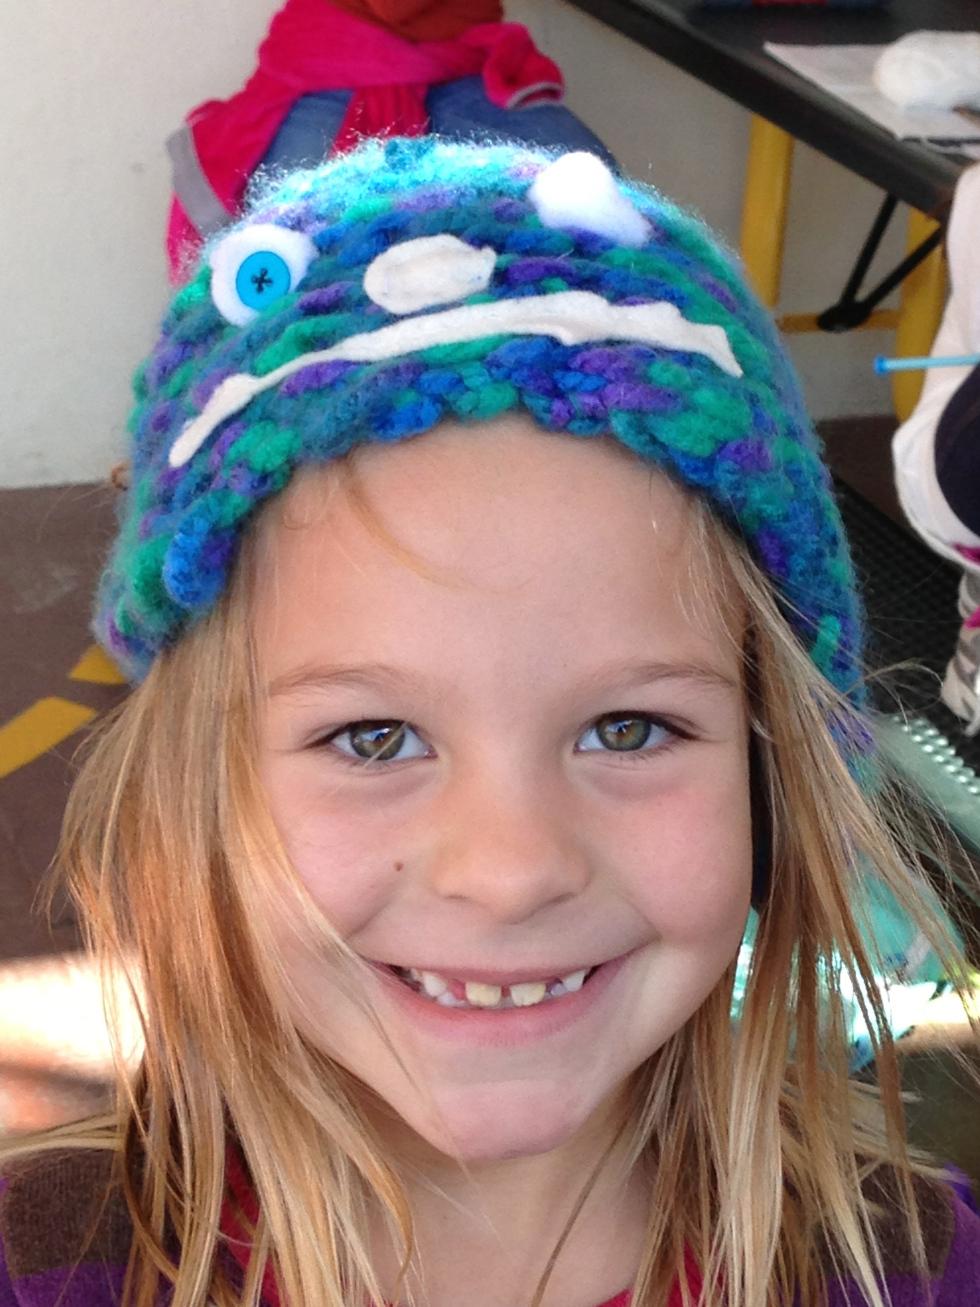 2nd grader - It's a monster hat!